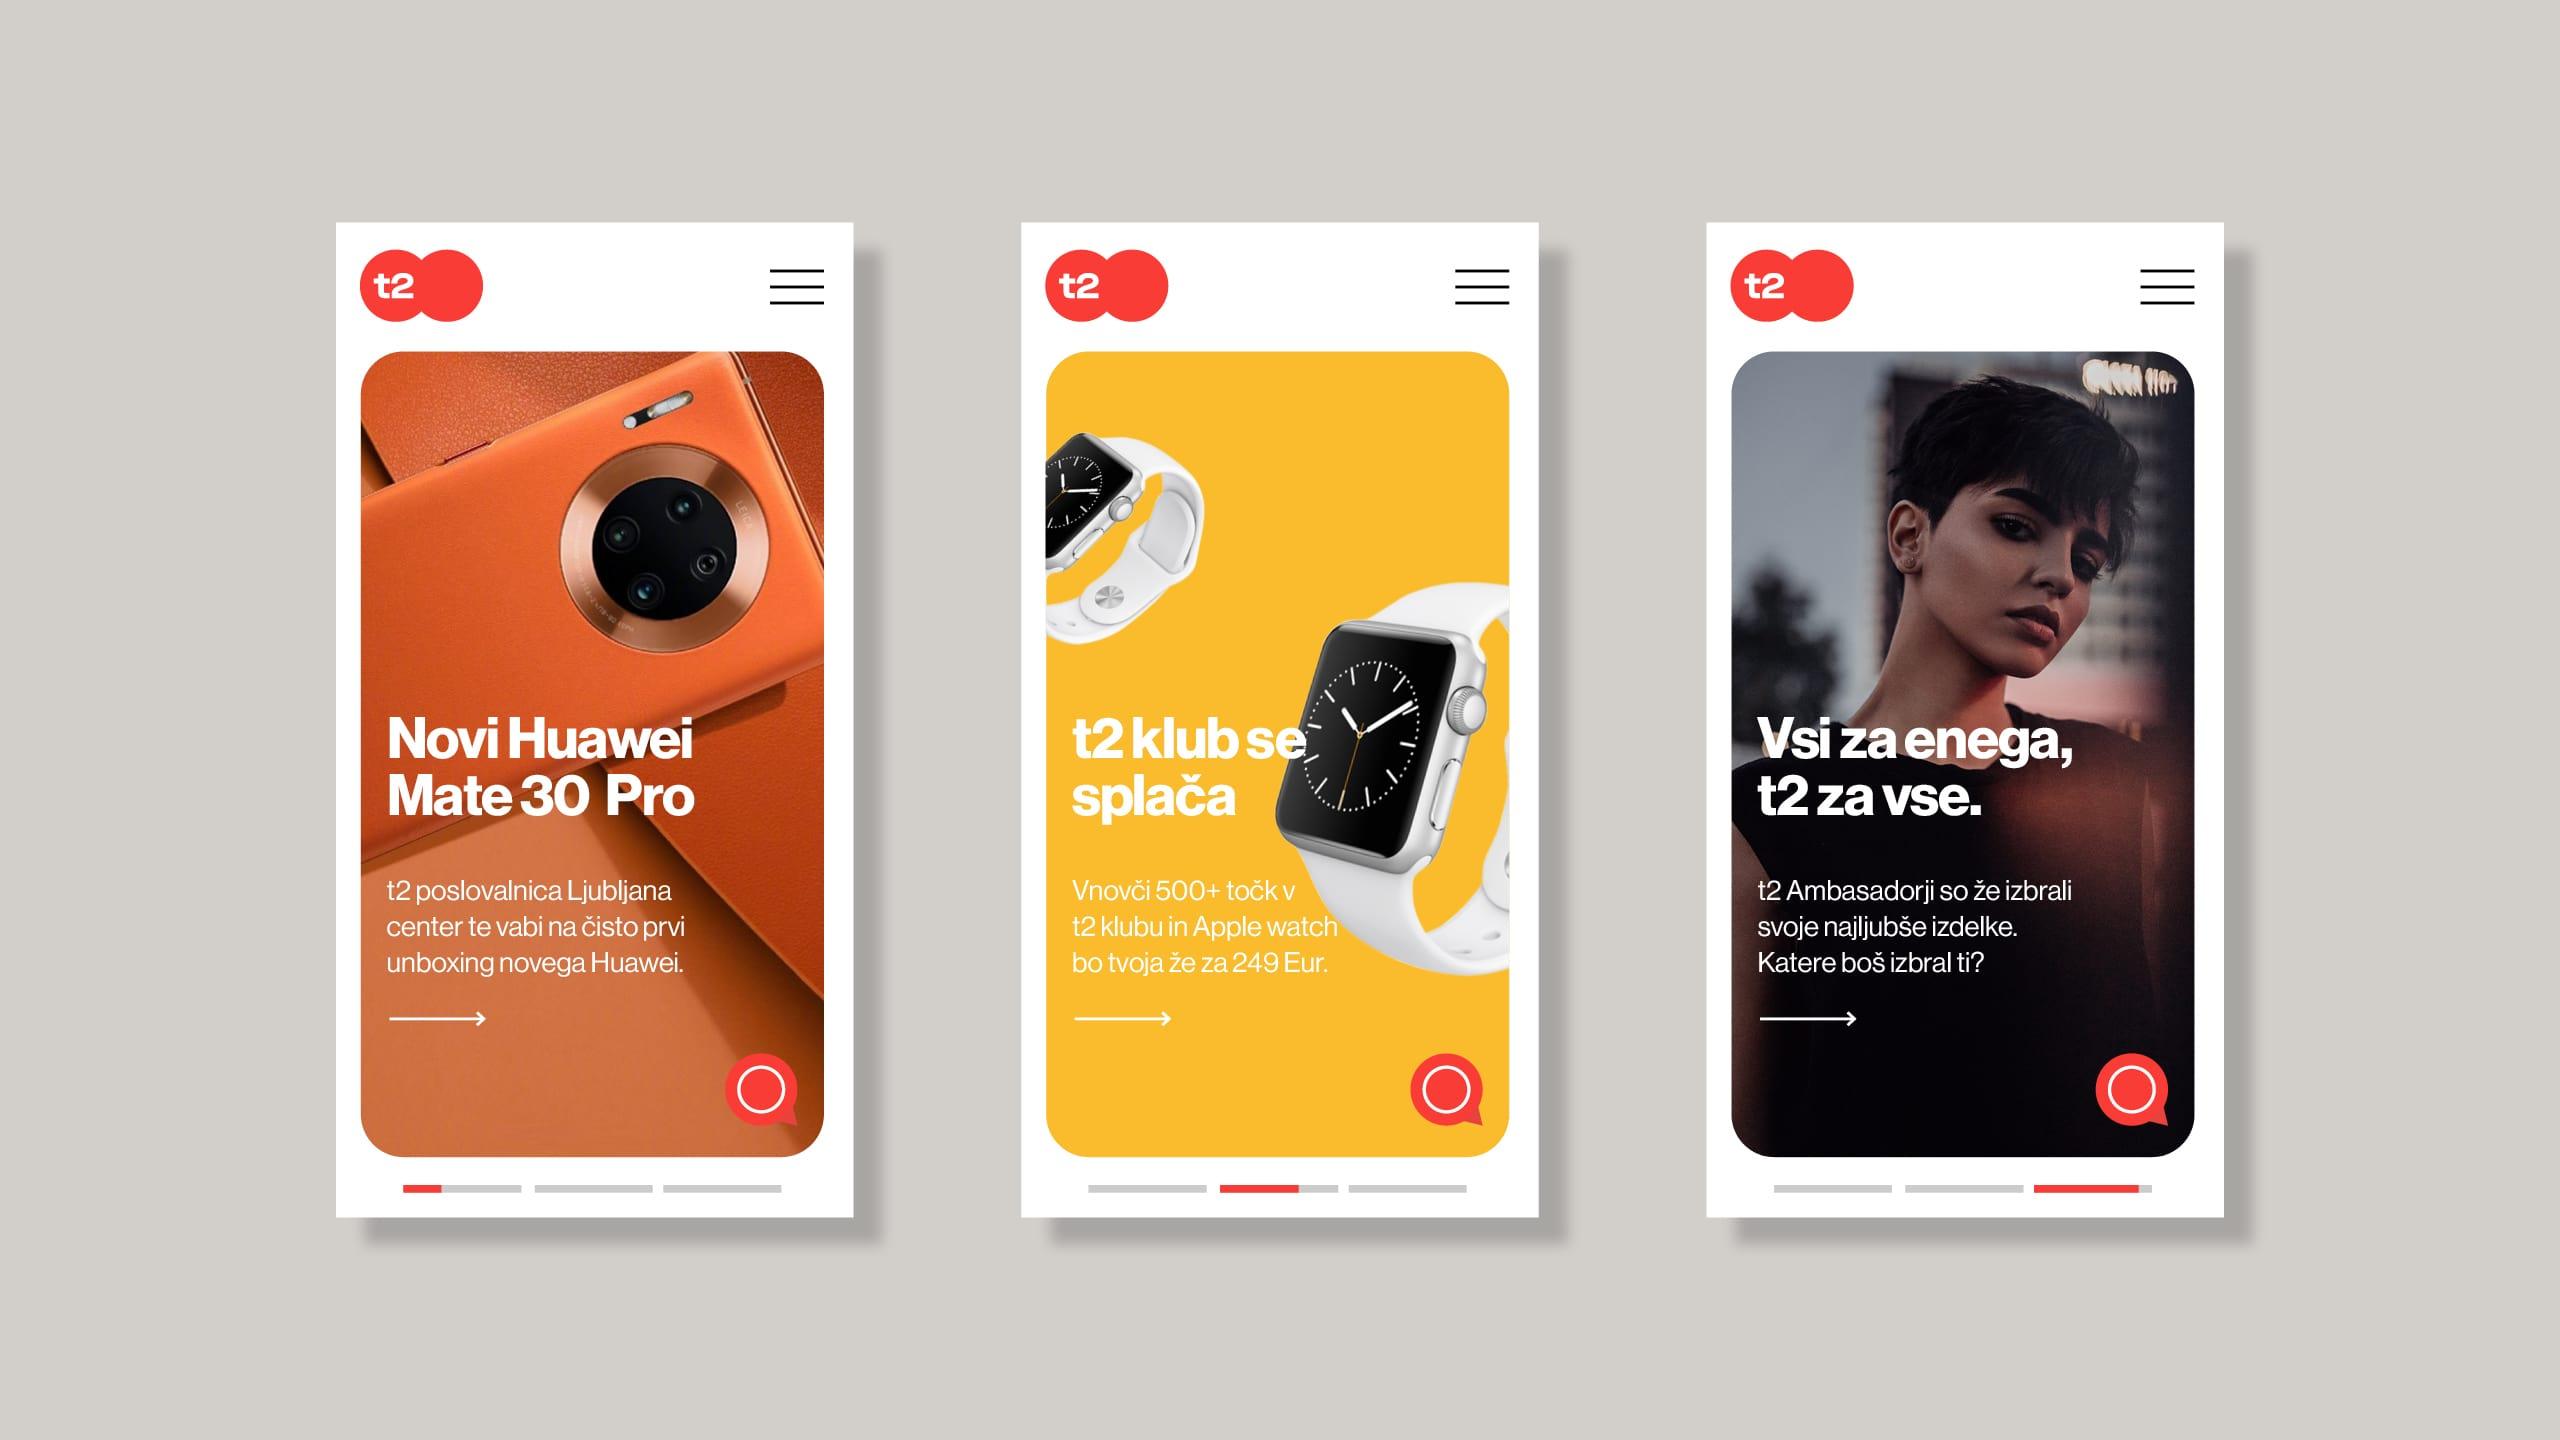 mantik-digital-branding-development-agency-creative-app-ui-web-branding-11-min